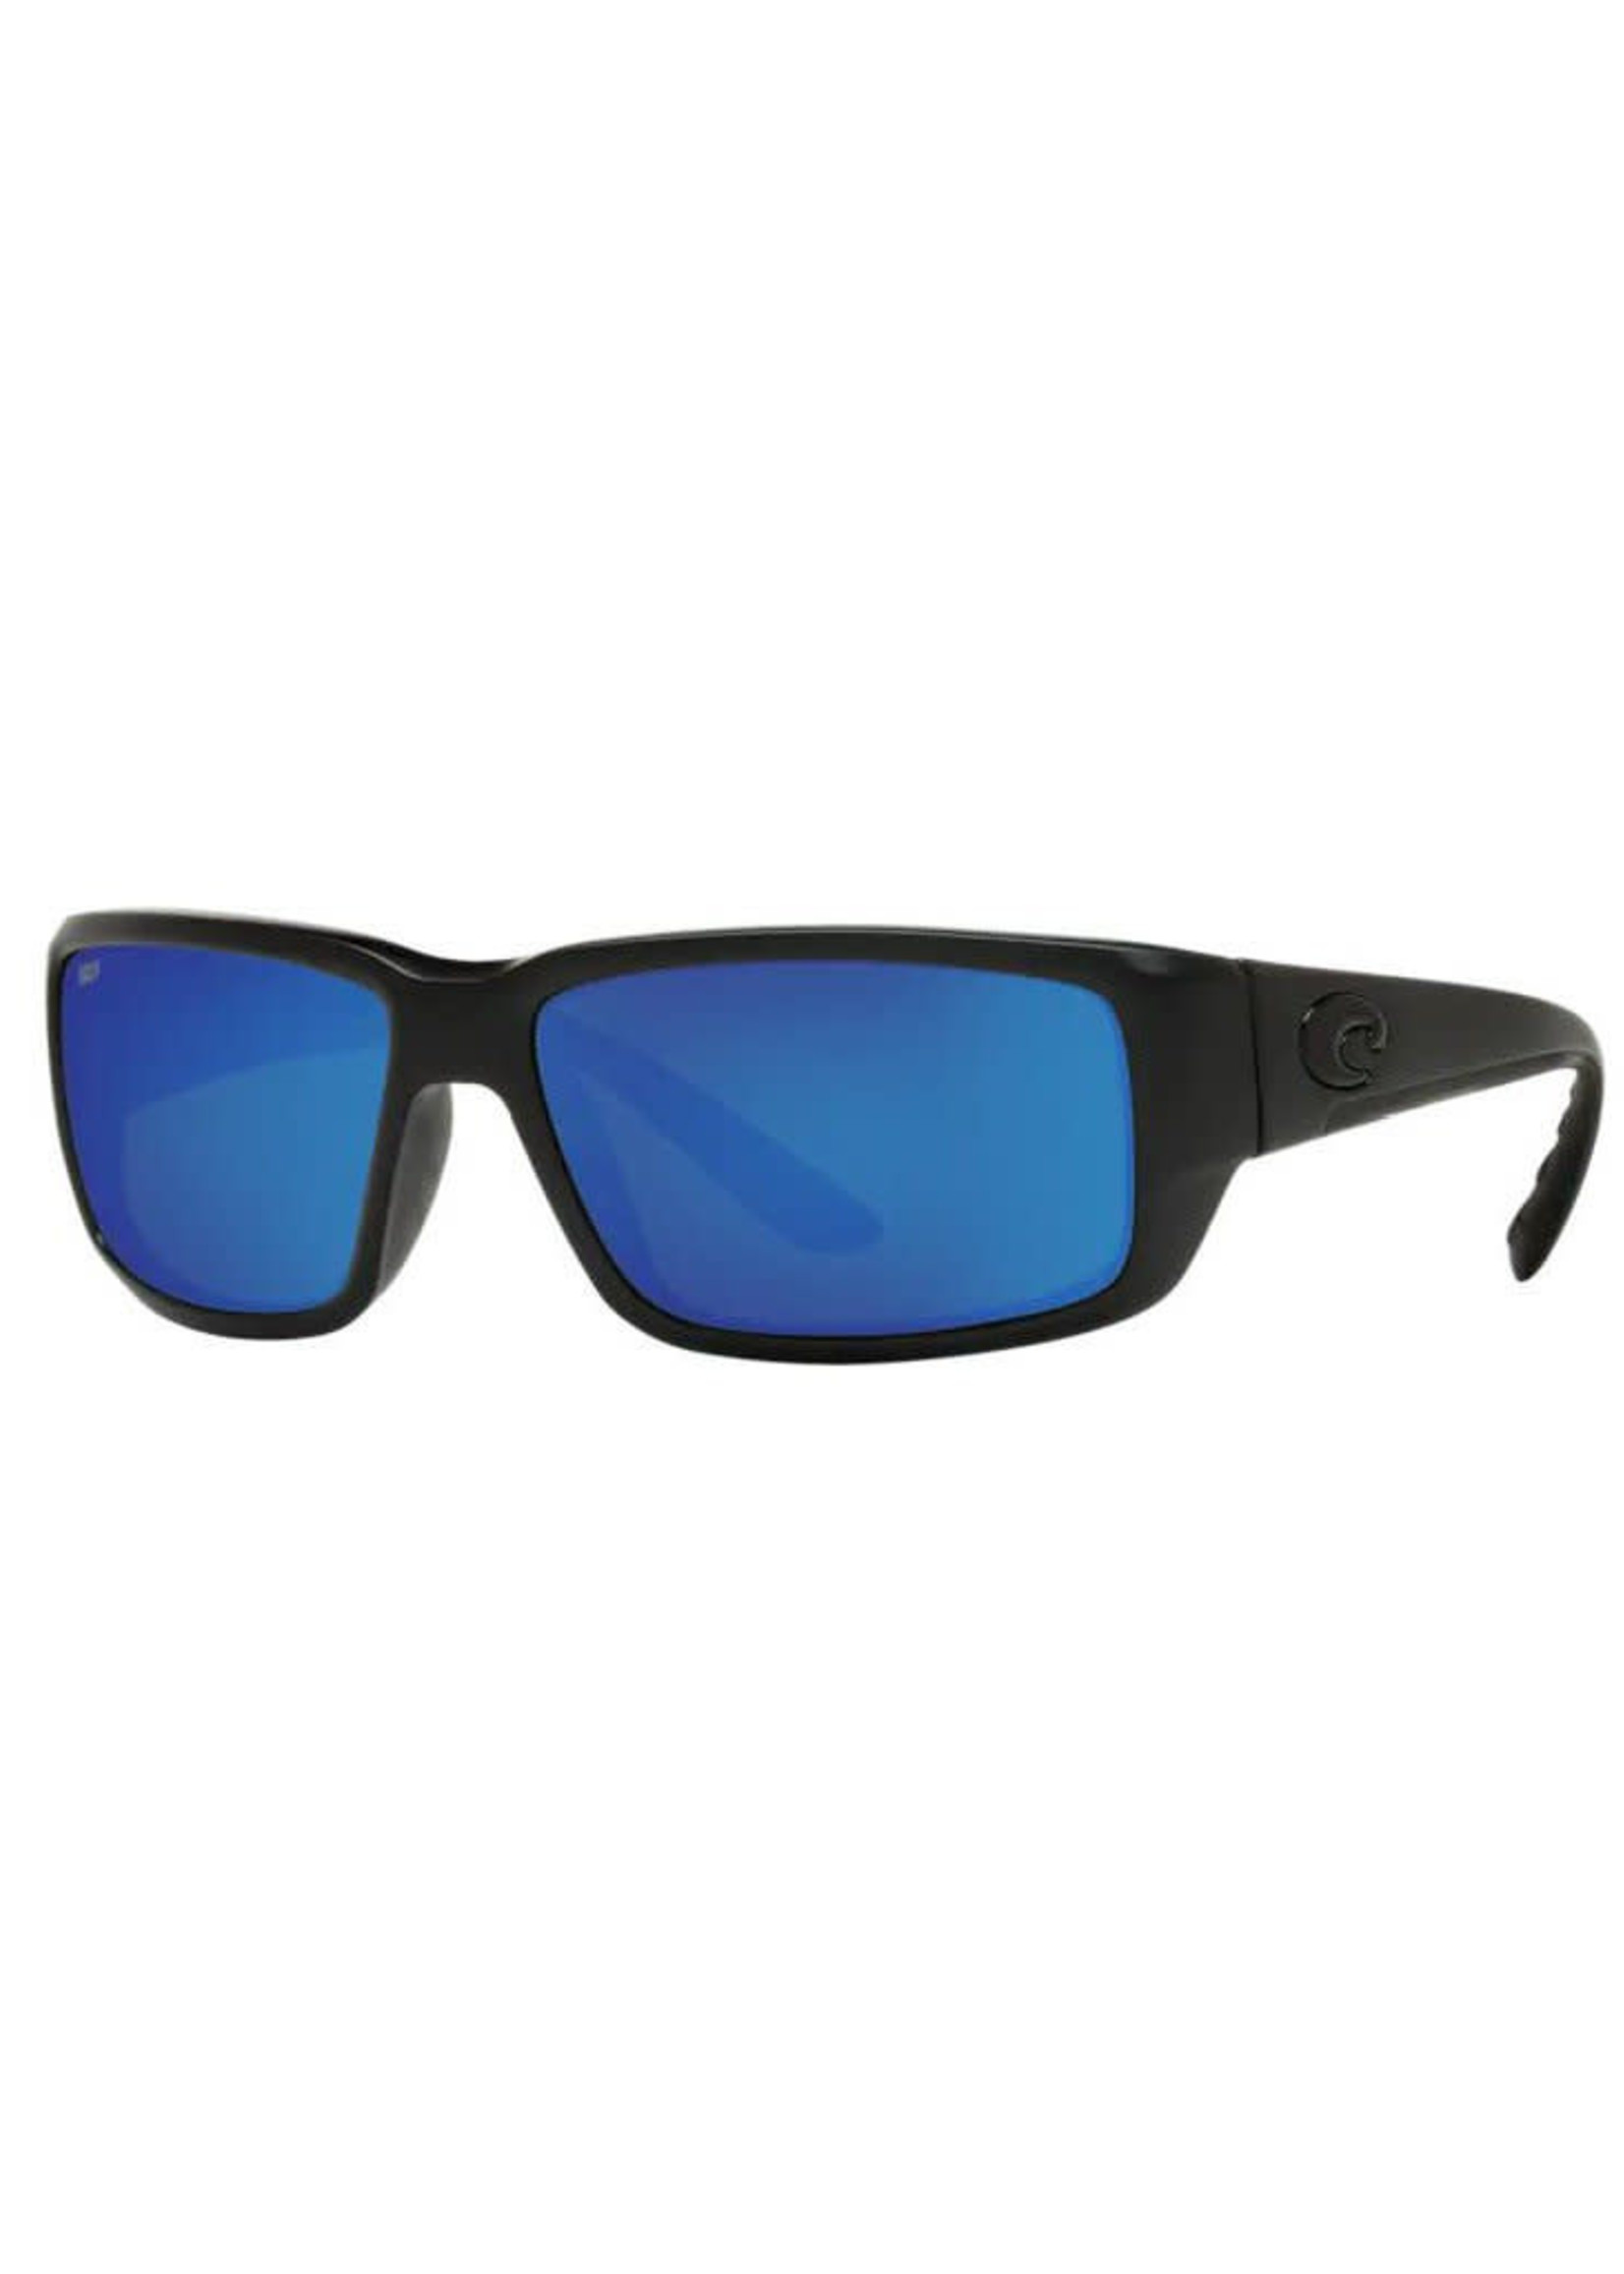 Costa del Mar Fantail Blackout Blue Mirror 580P